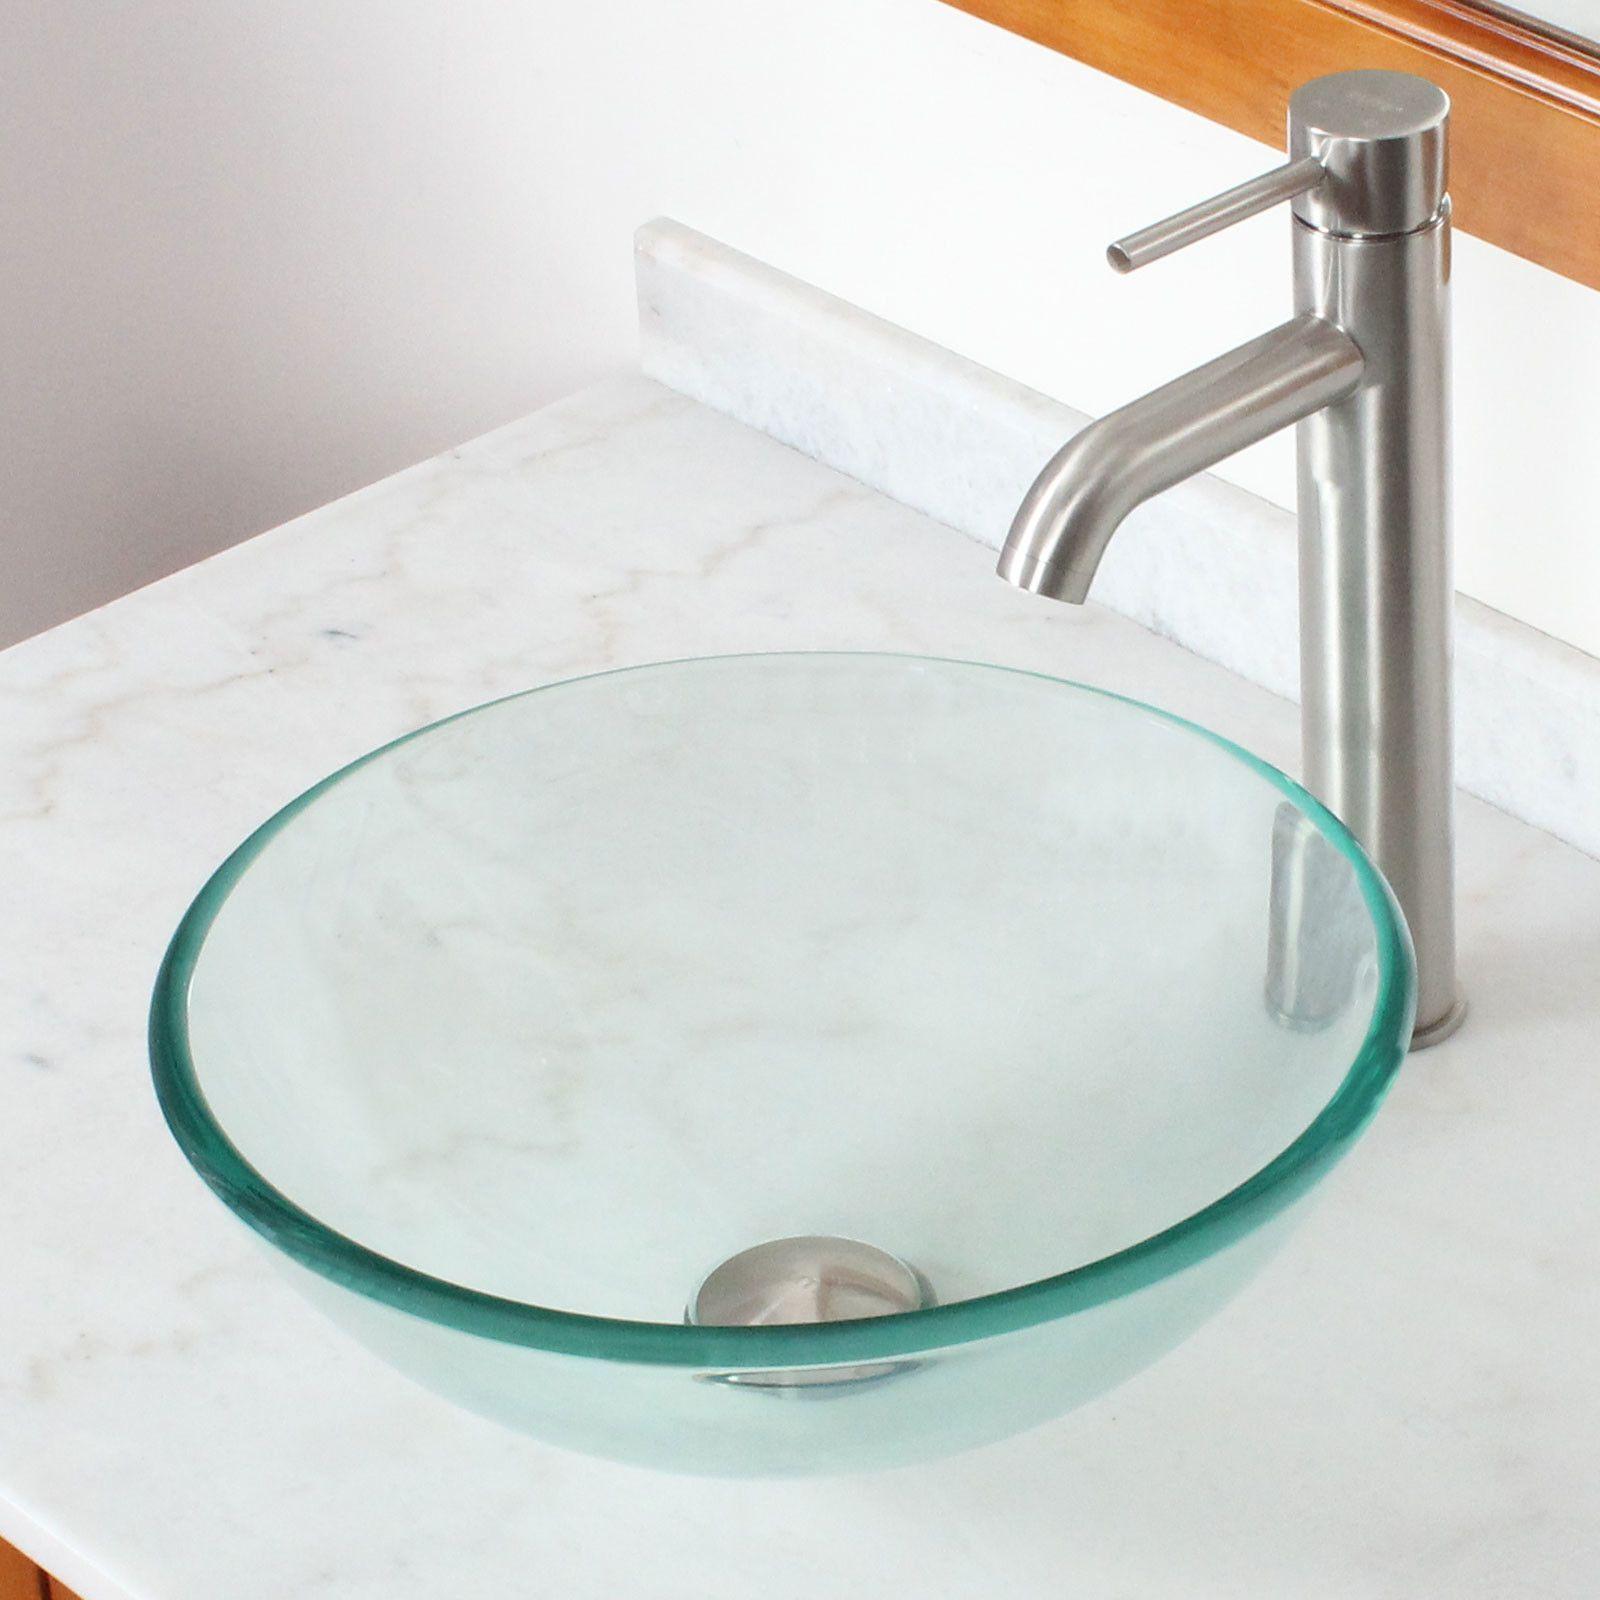 Solo Modern Glass Bowl Sink Wall Mount